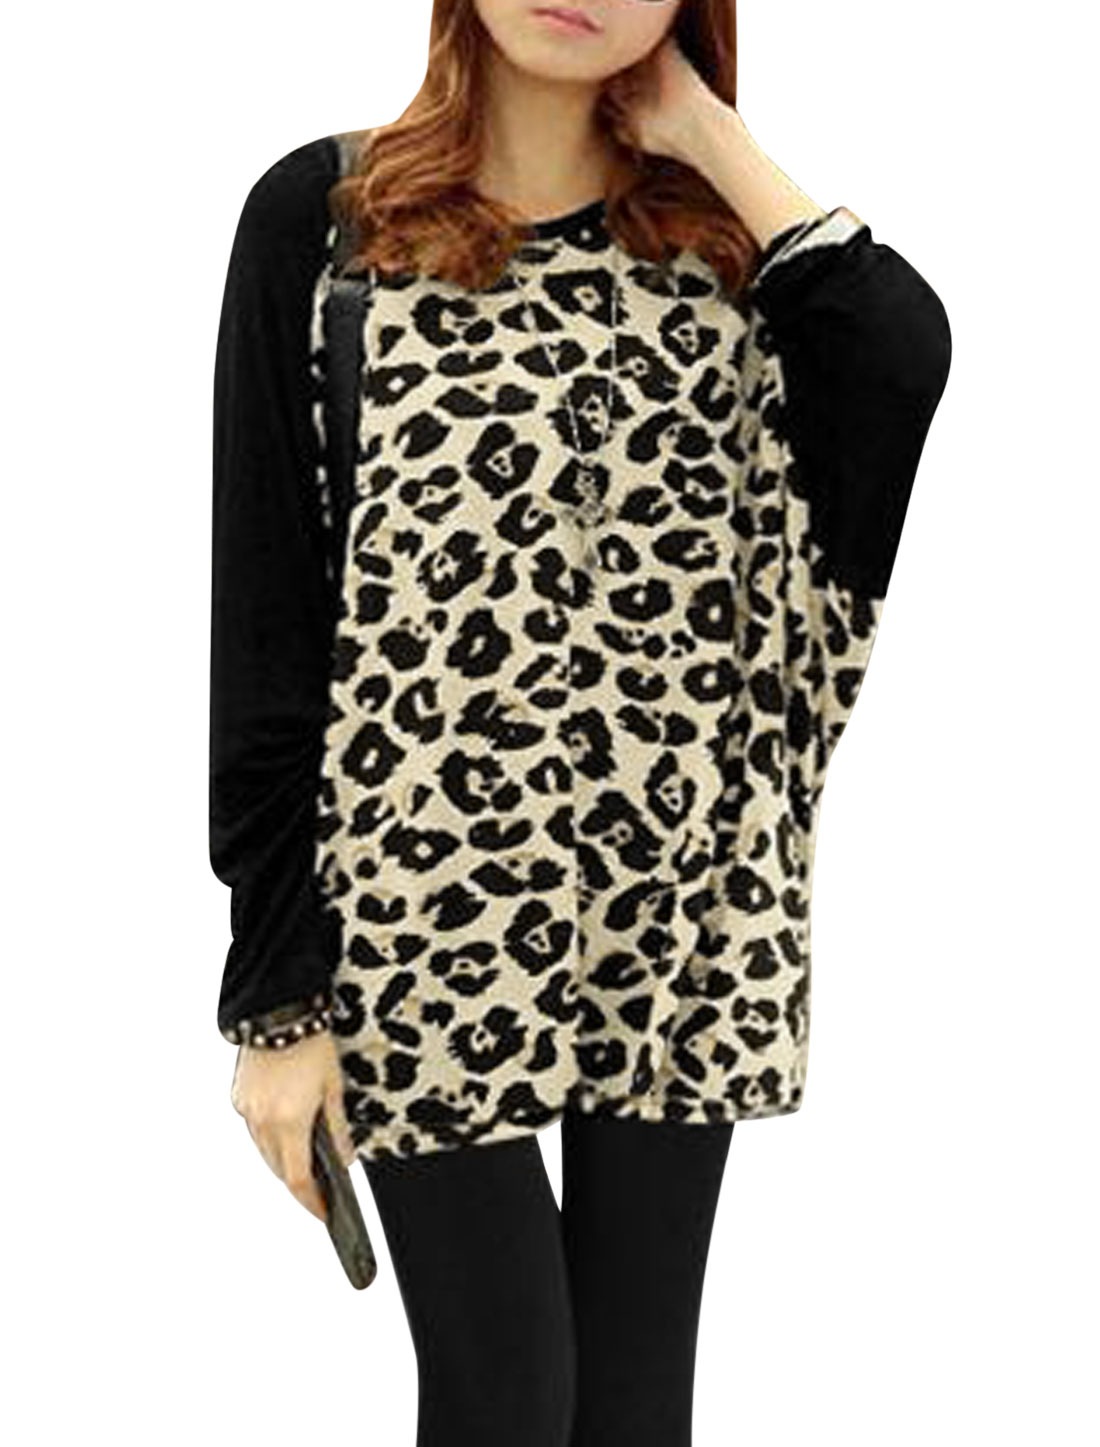 Women Leopard Prints Long Sleeve Round Neck Casual Tunic Blouse Black Beige XS